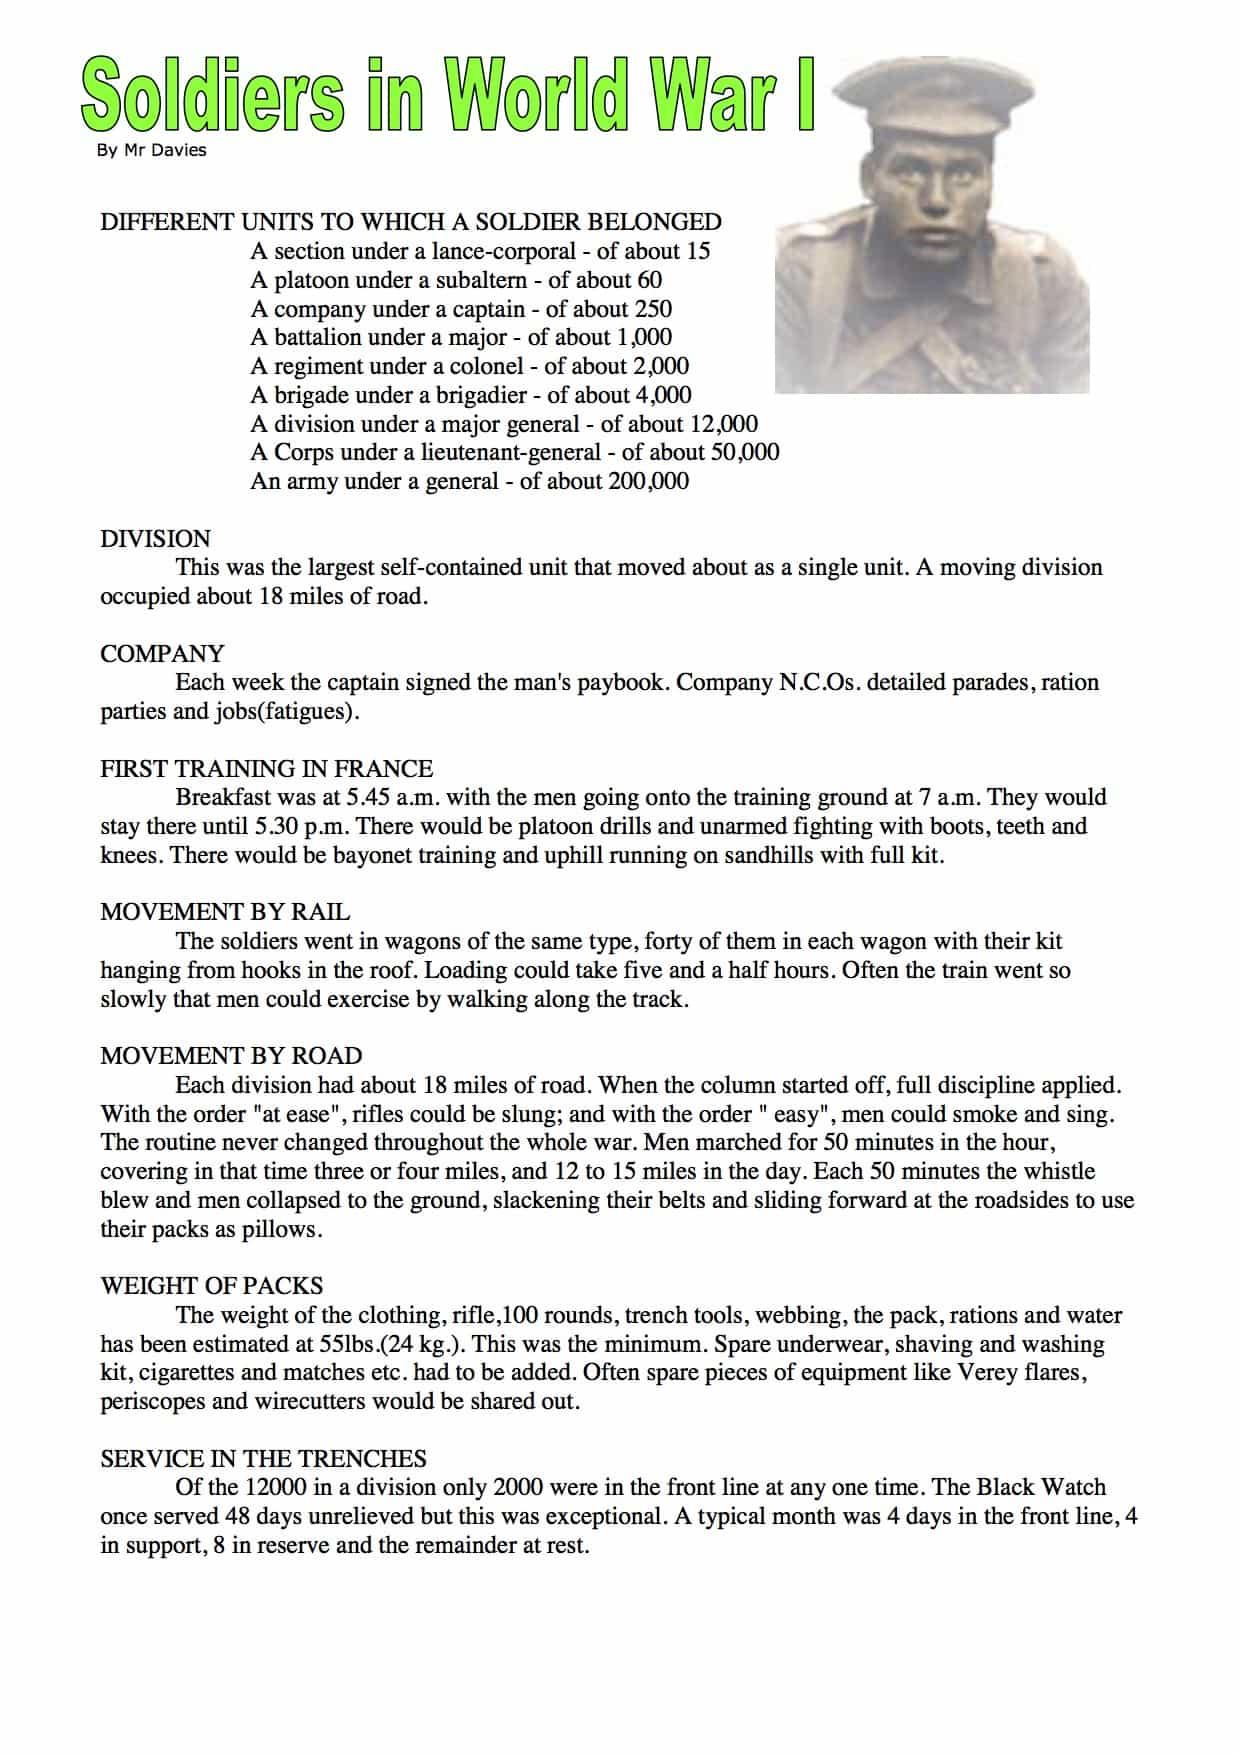 Easy World War 2 Worksheet